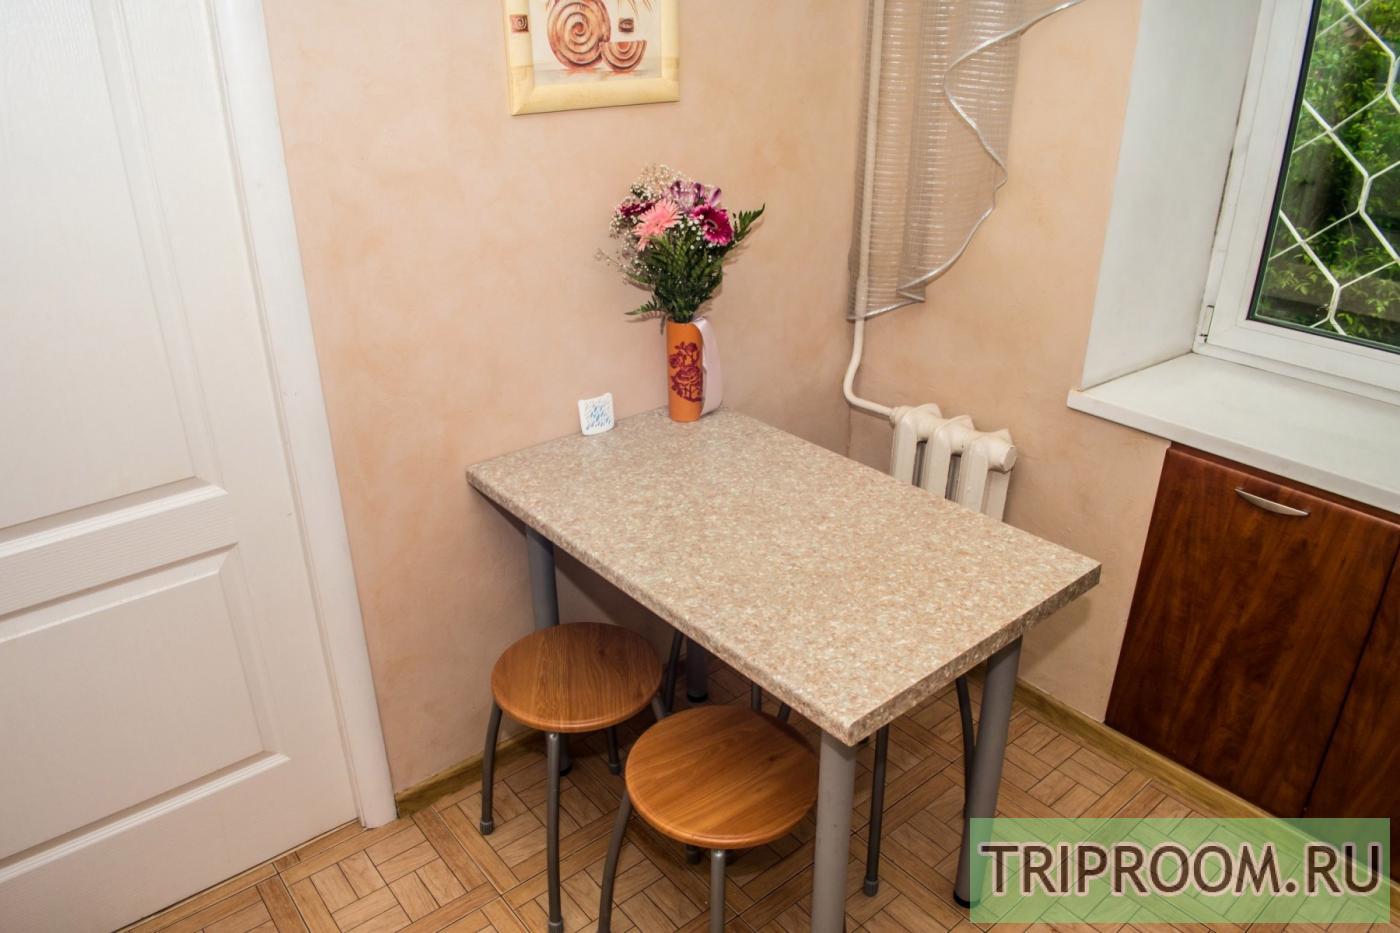 2-комнатная квартира посуточно (вариант № 20494), ул. Газеты звезда, фото № 2